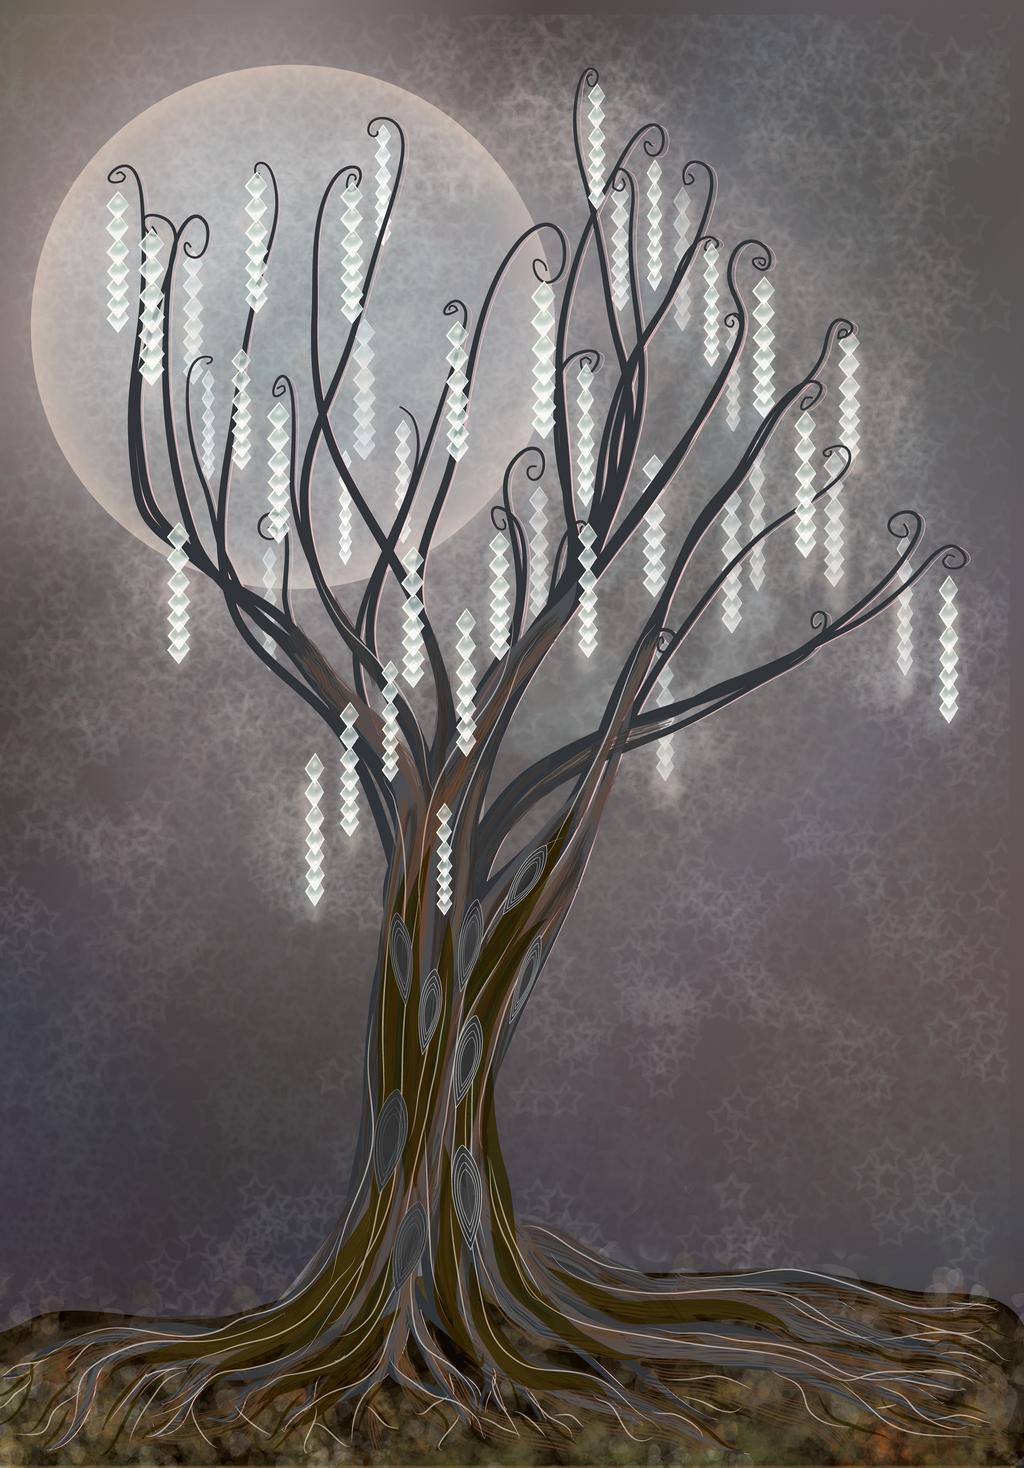 Tree of Light Christmas card design